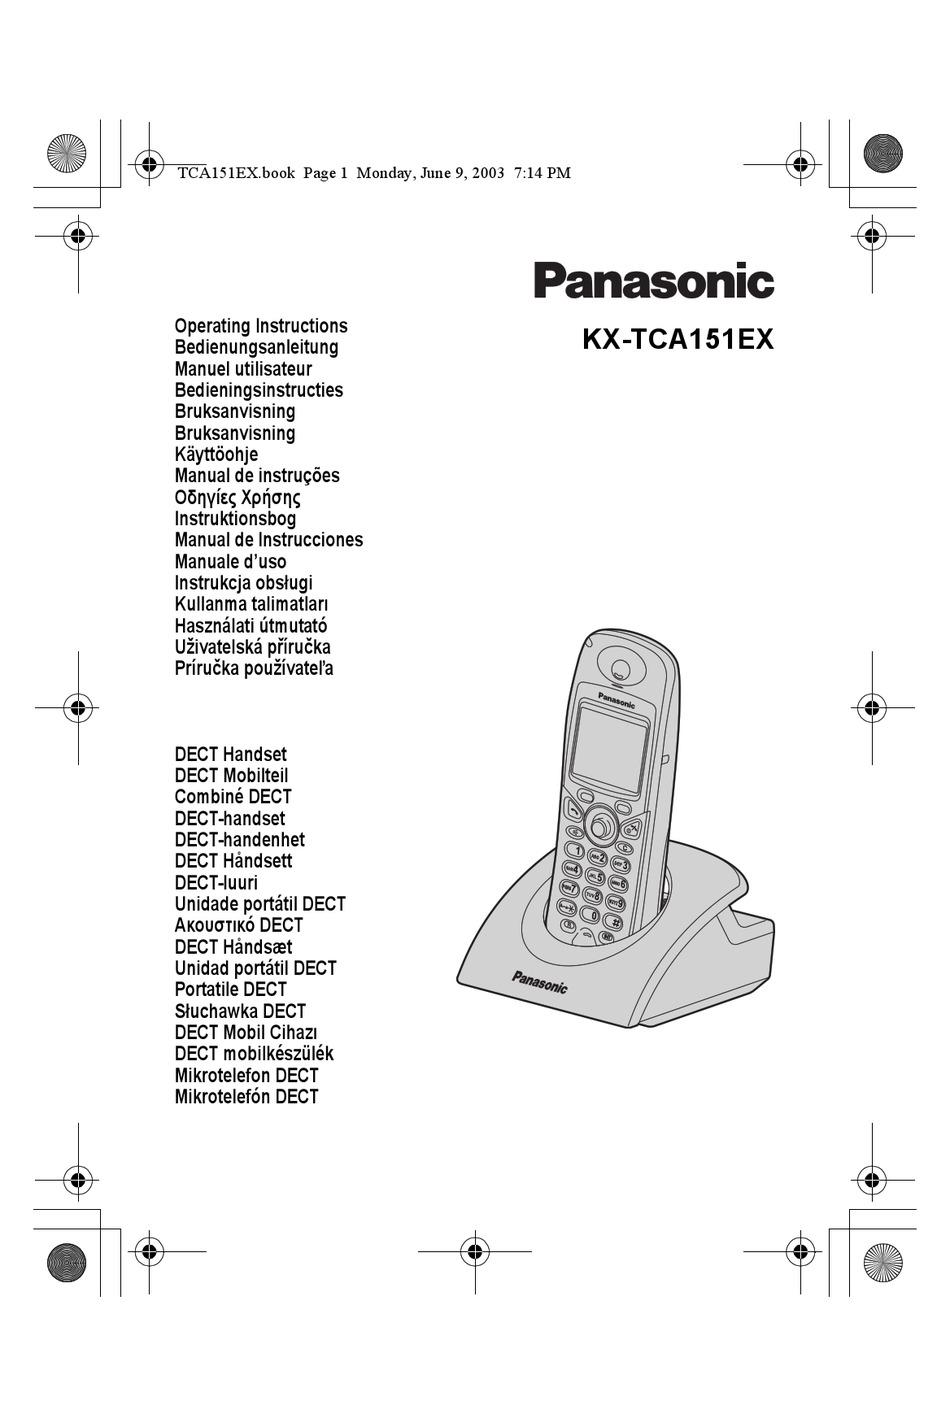 PANASONIC KX-TCA151EX OPERATING INSTRUCTIONS MANUAL Pdf